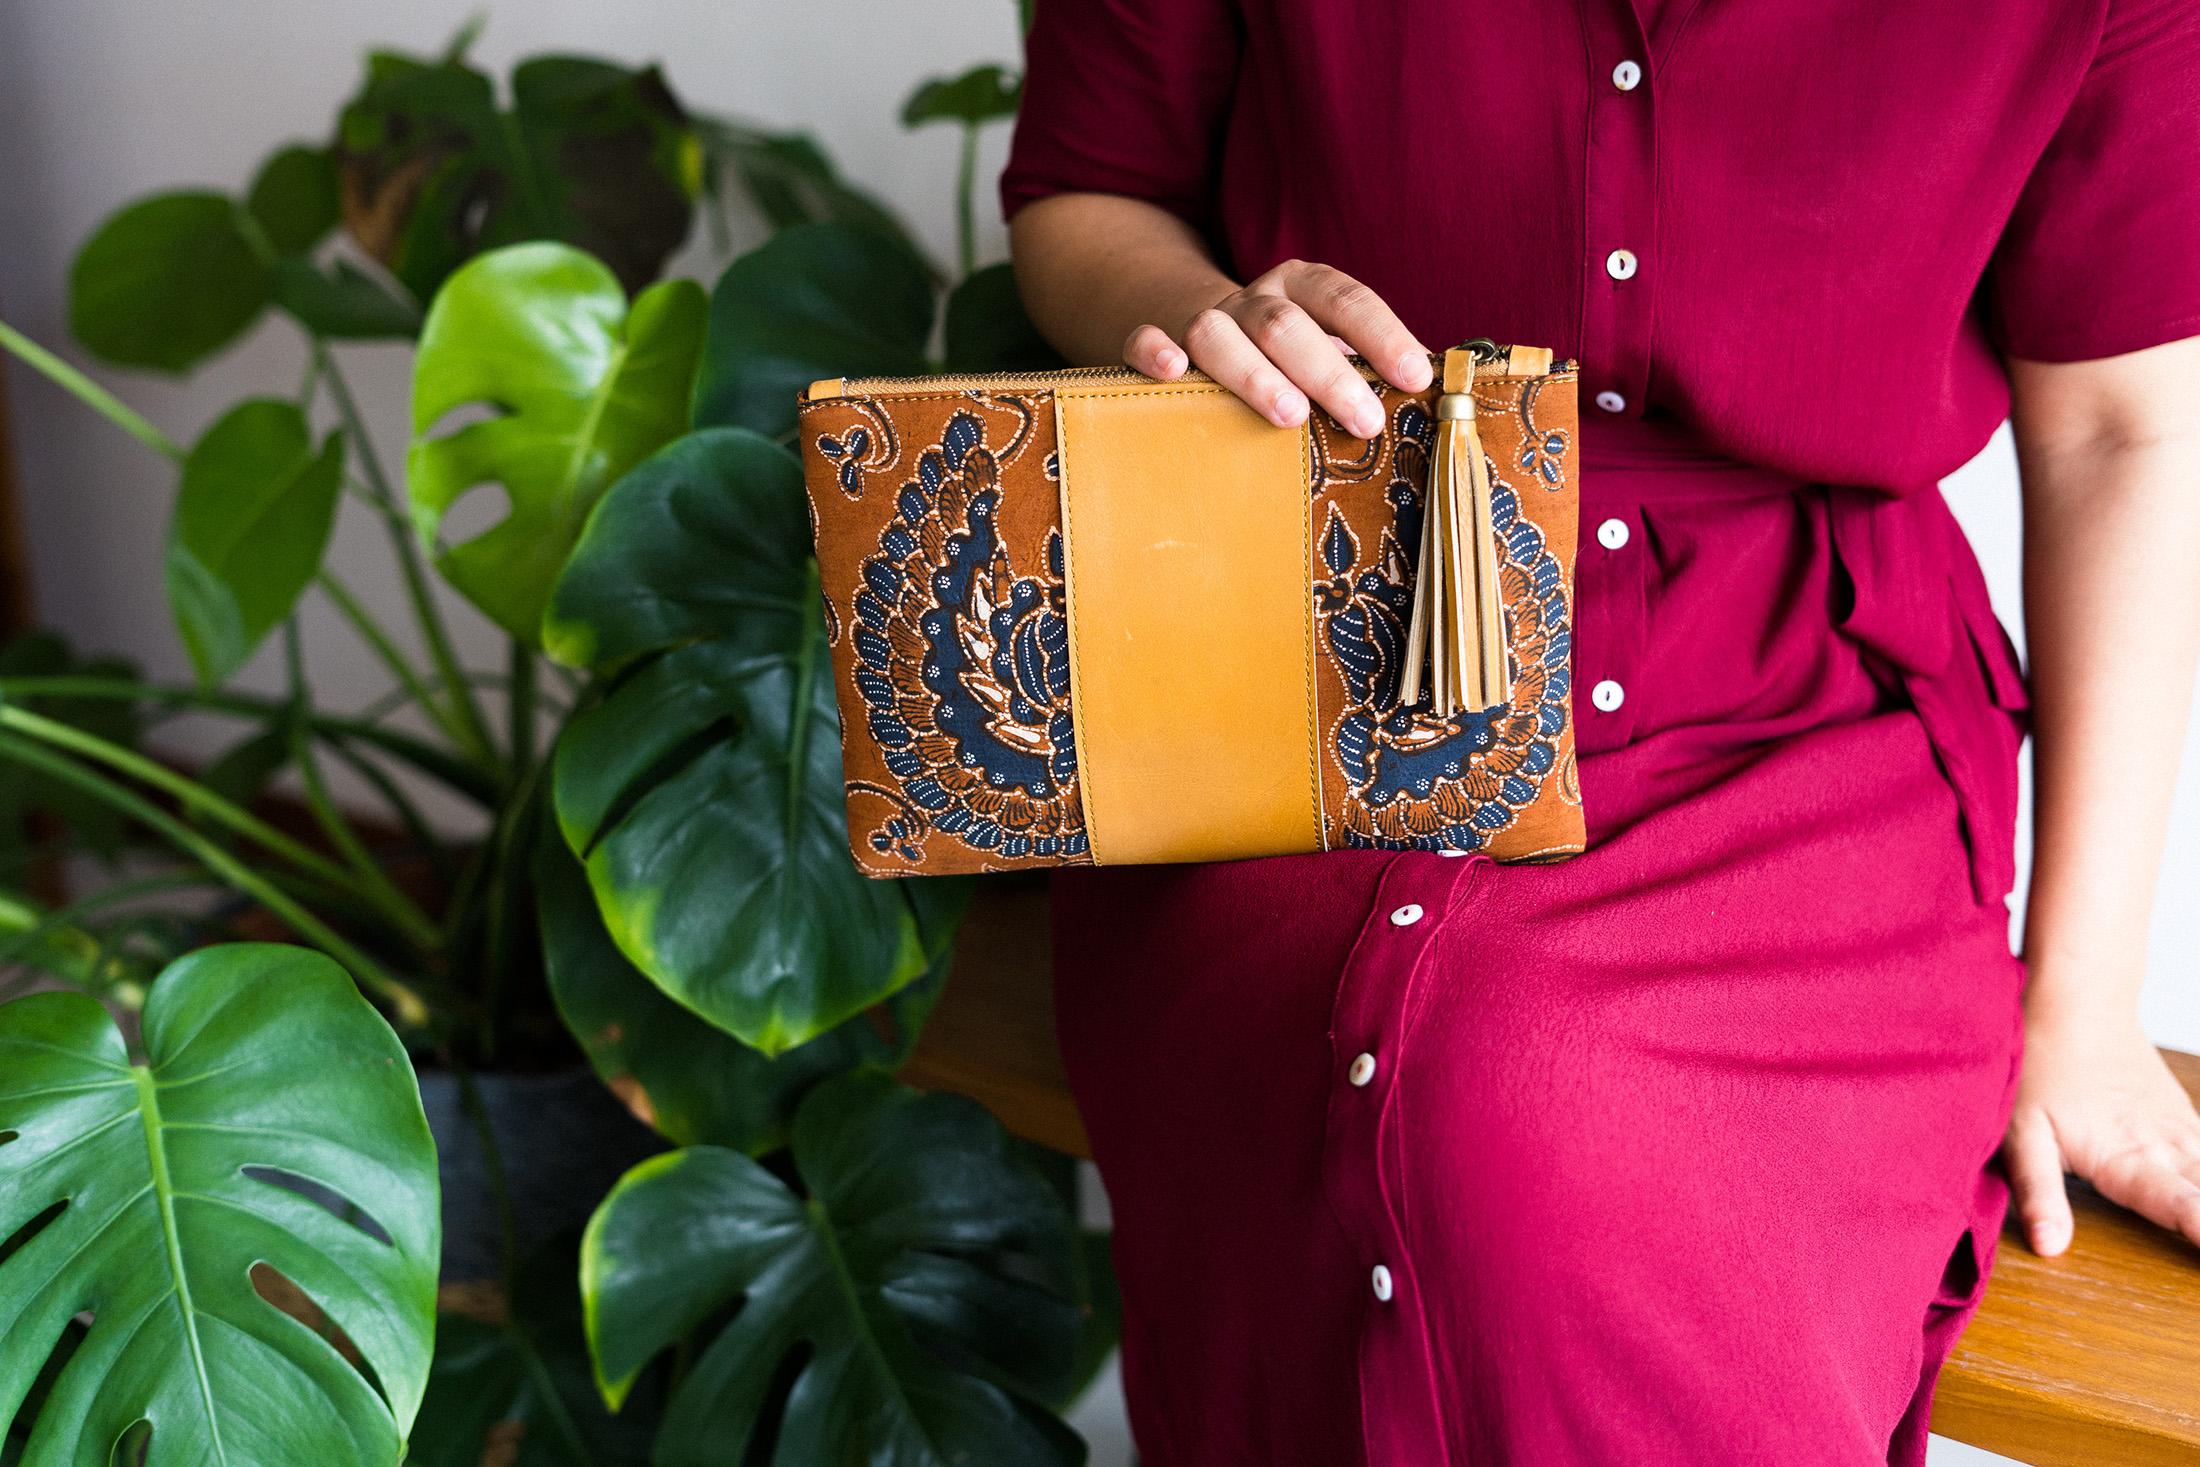 singapore-photographer-gypsied-batik-clutch-layar-indra-2.jpg